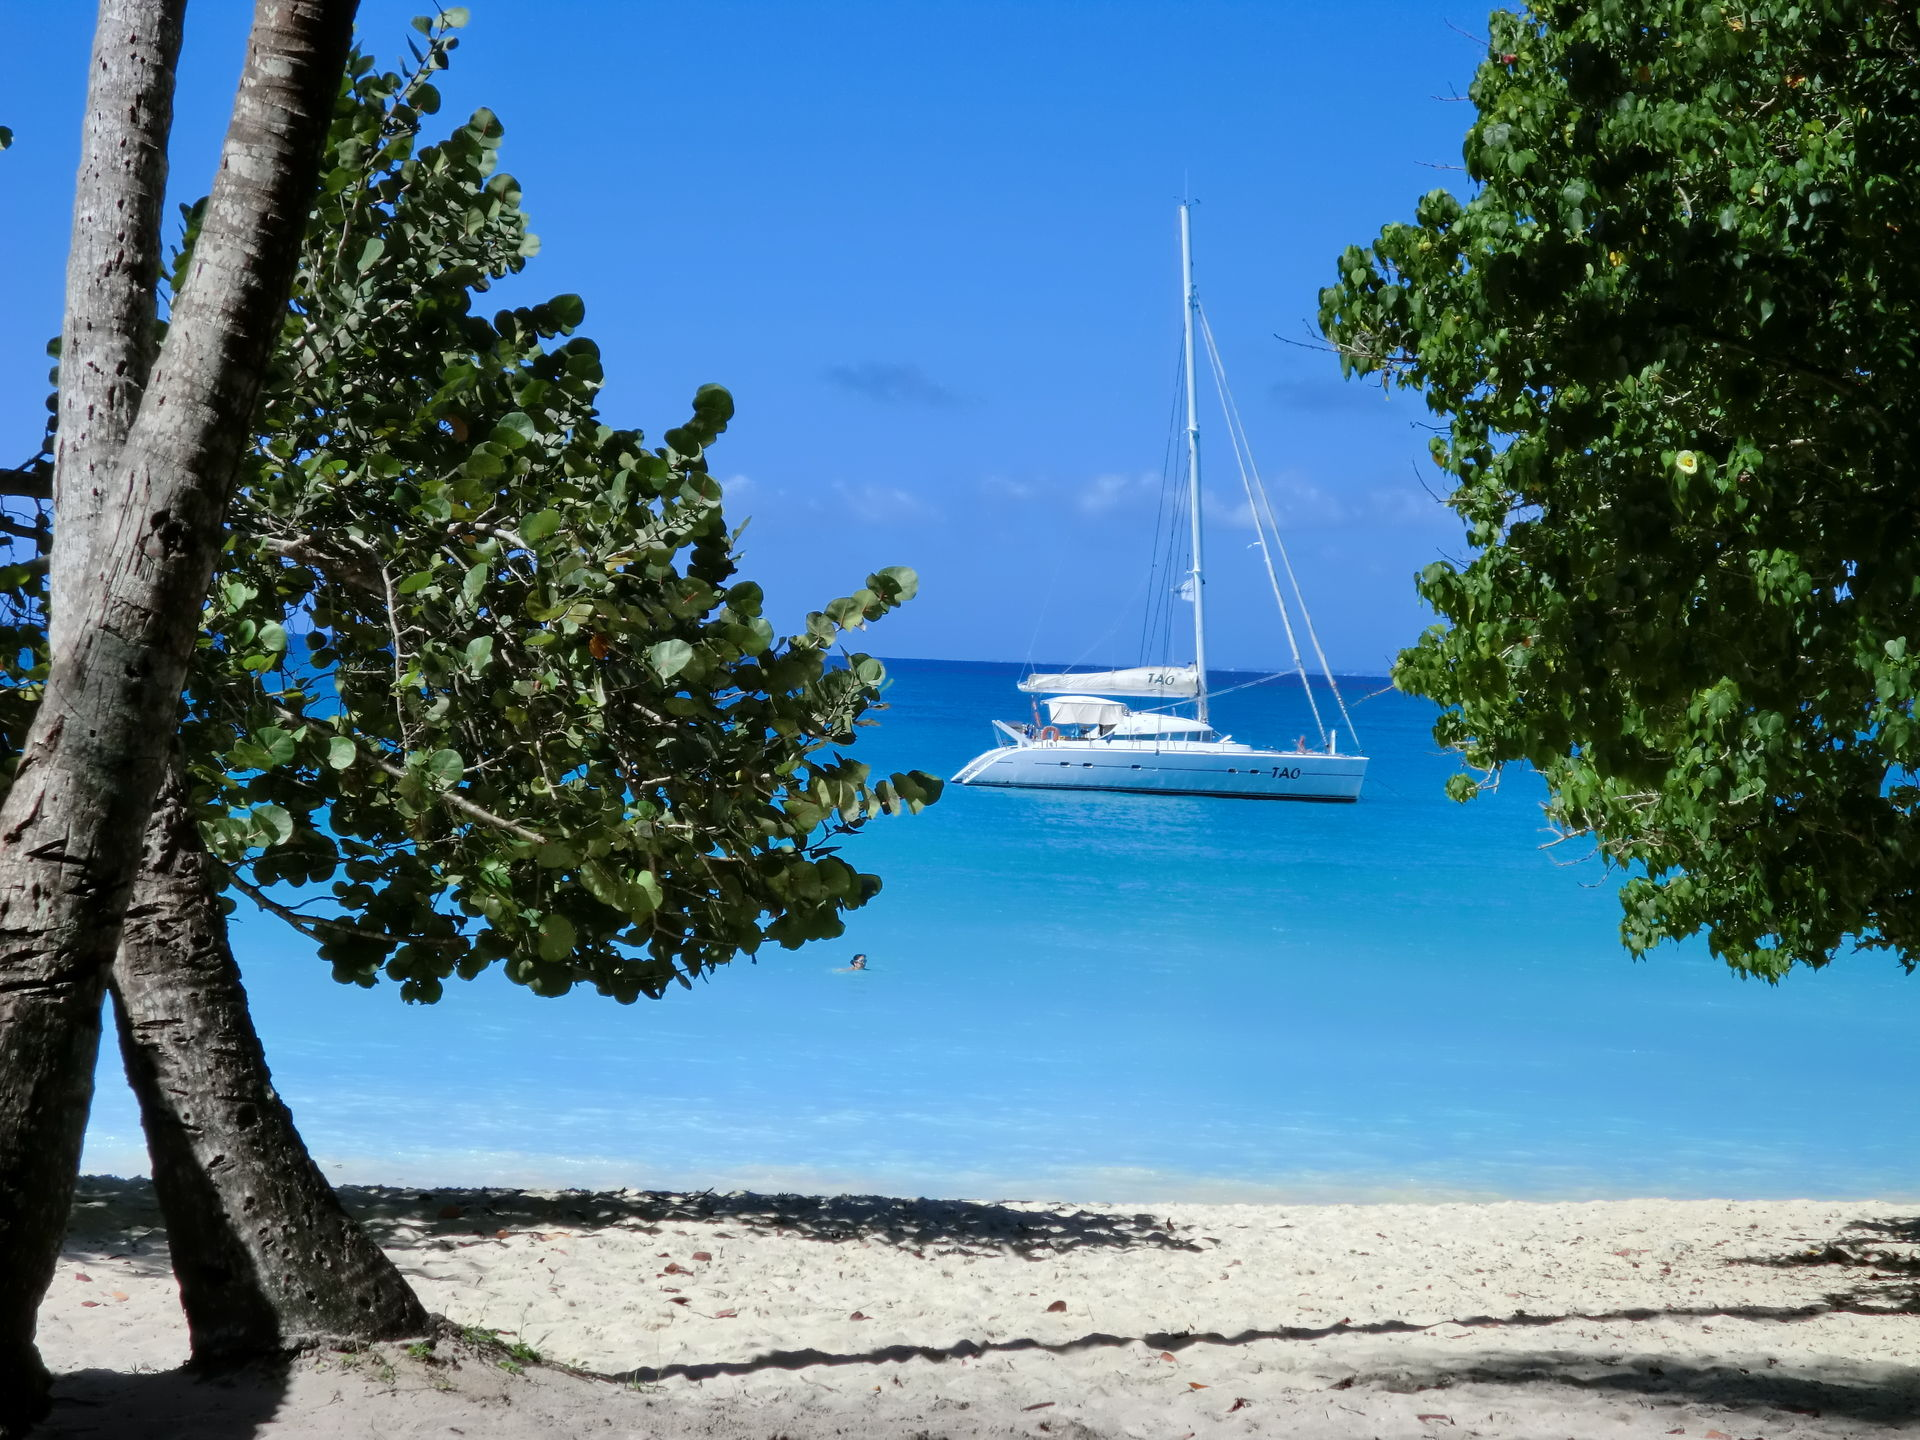 Croisiere Odyssee Caraibes Guadeloupe Avec Voyages Leclerc